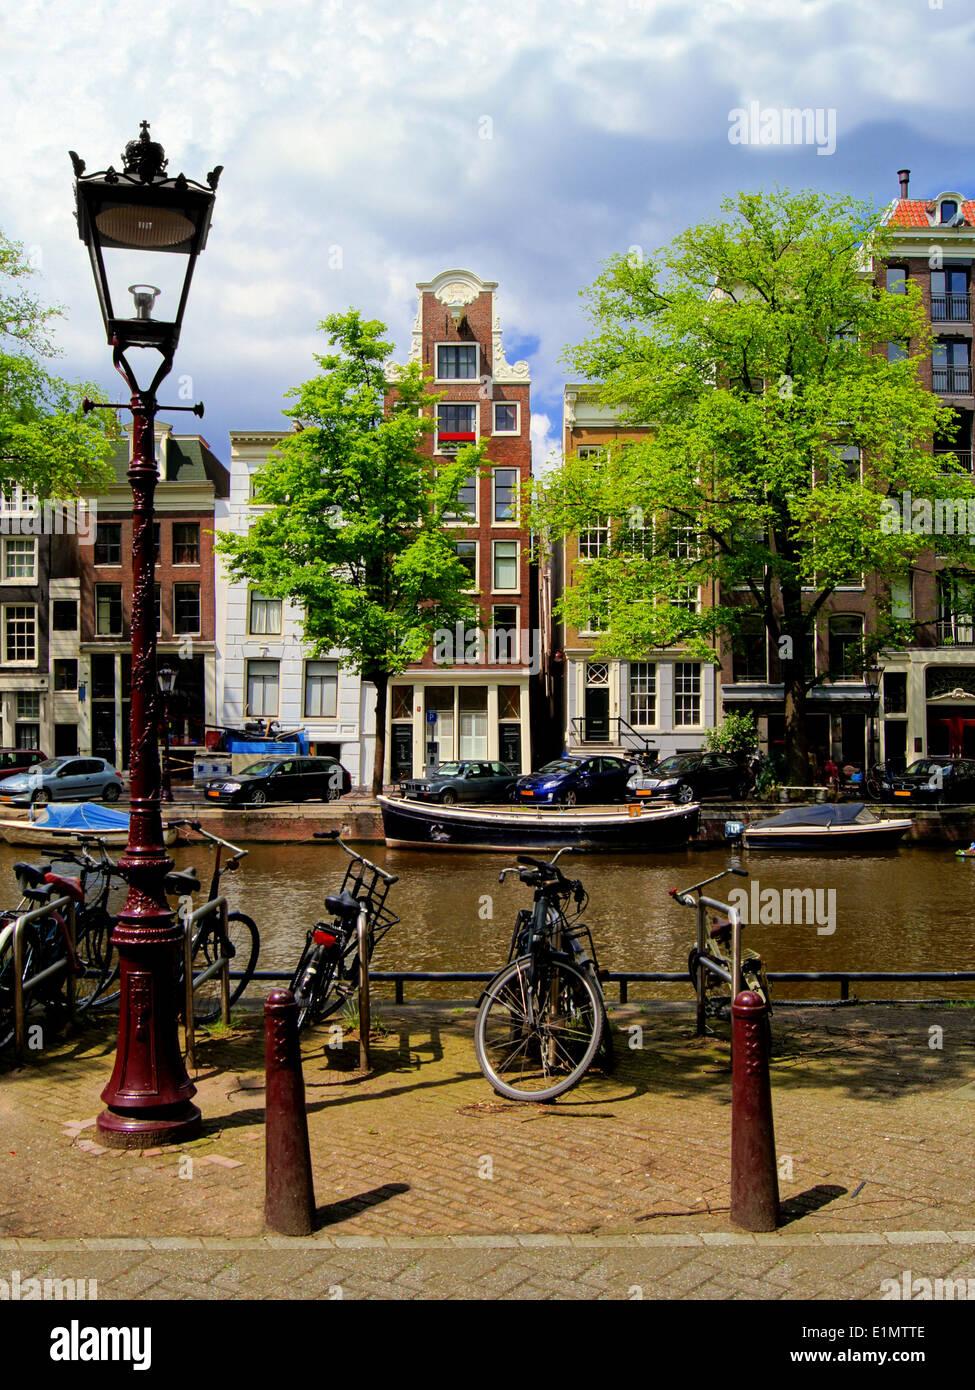 Classic Amsterdam canal scene - Stock Image